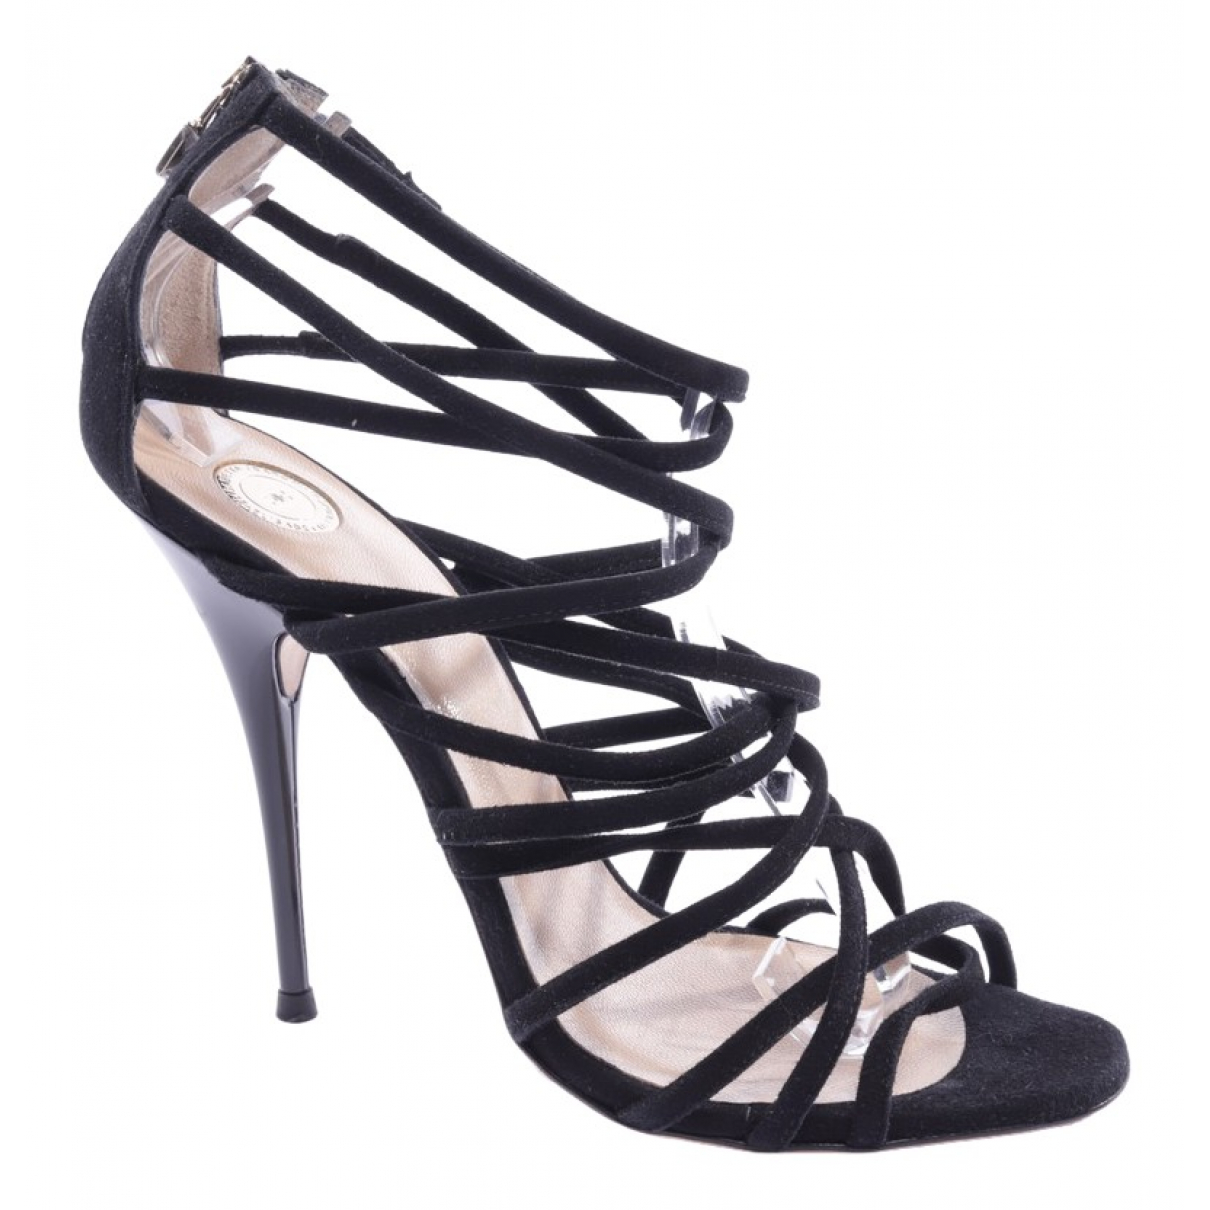 Sandalias de Cuero Elisabetta Franchi